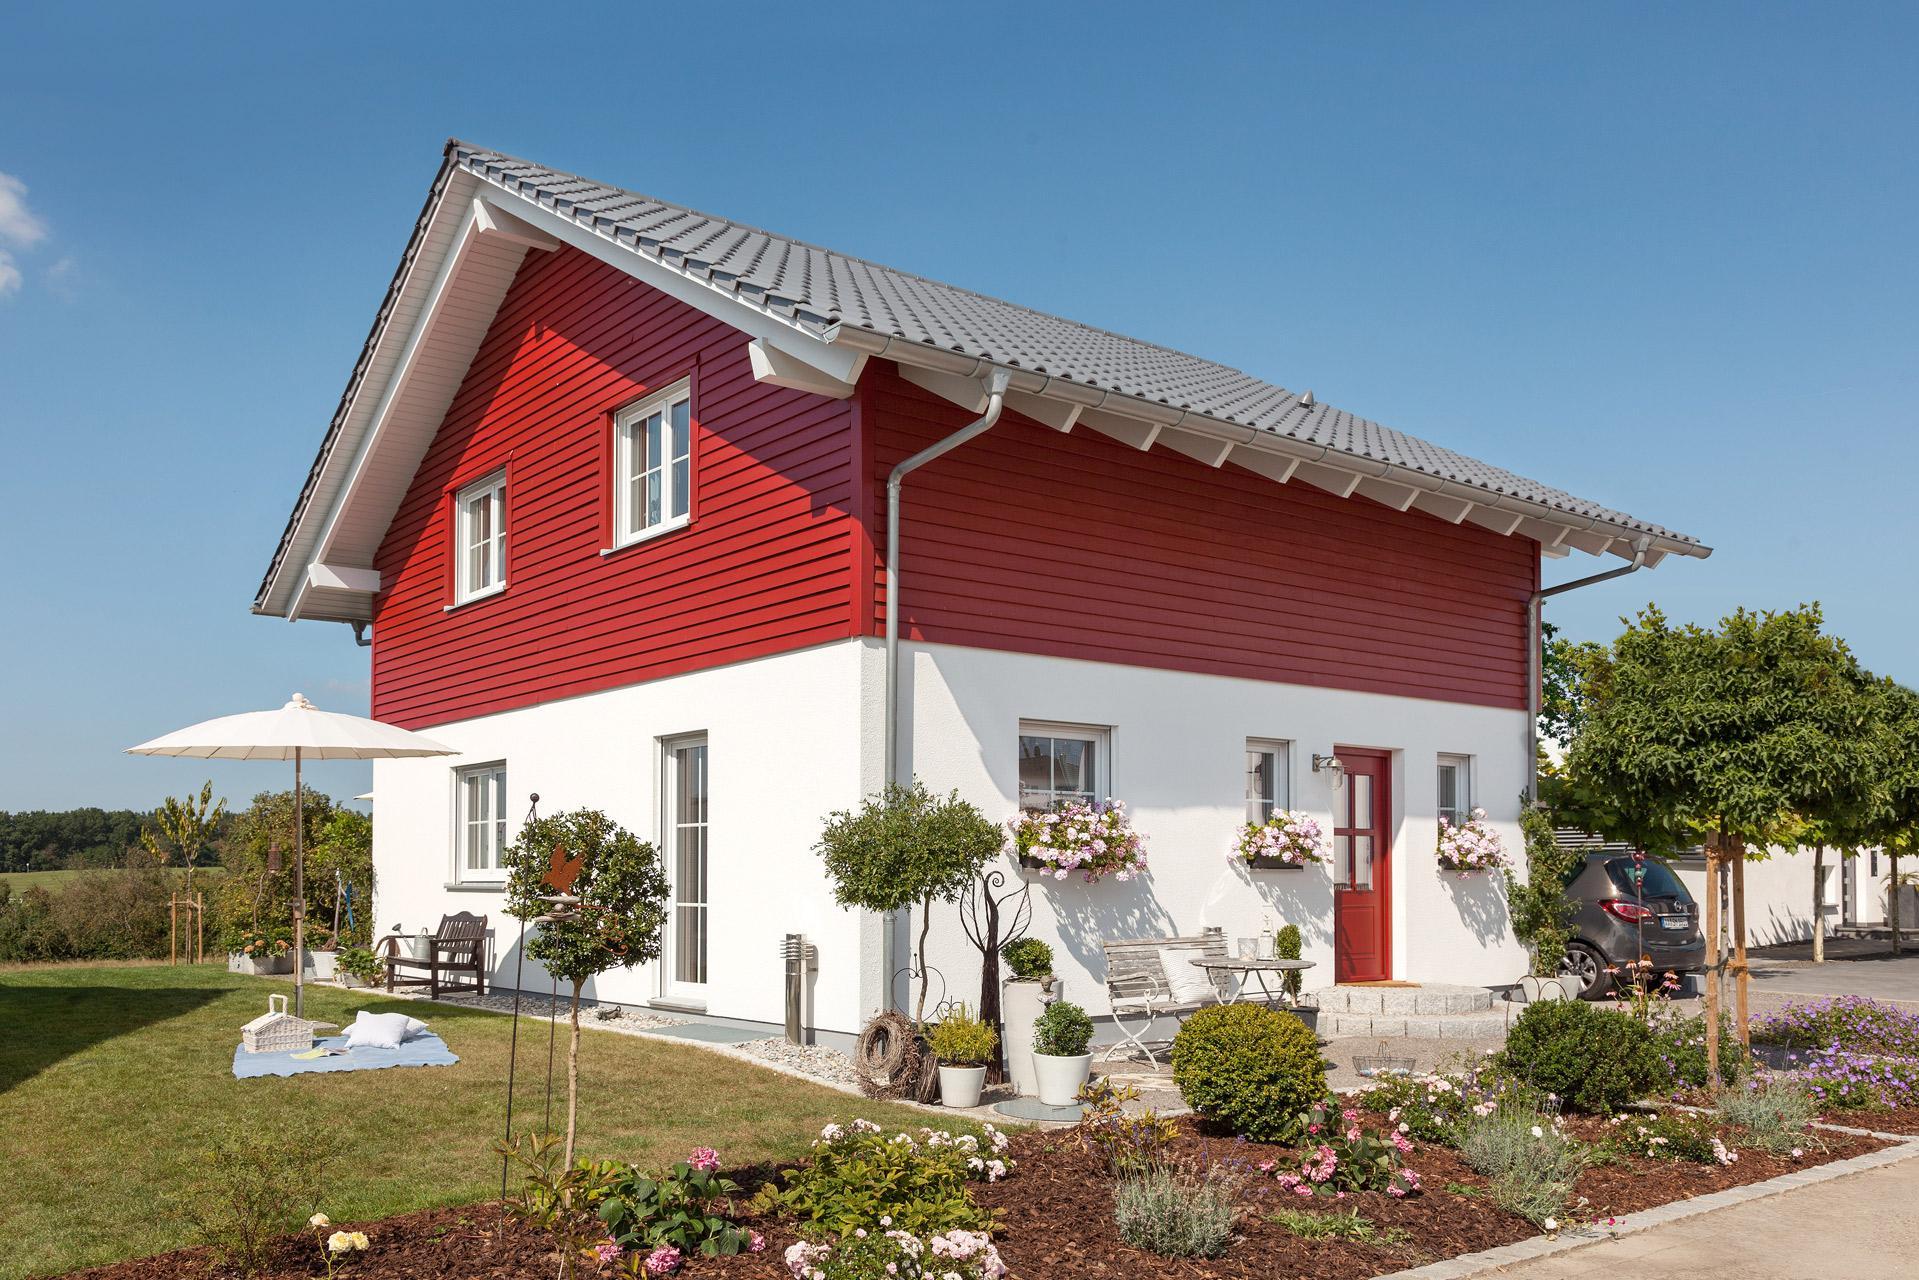 Maison de campagne moderne | SchwörerHaus